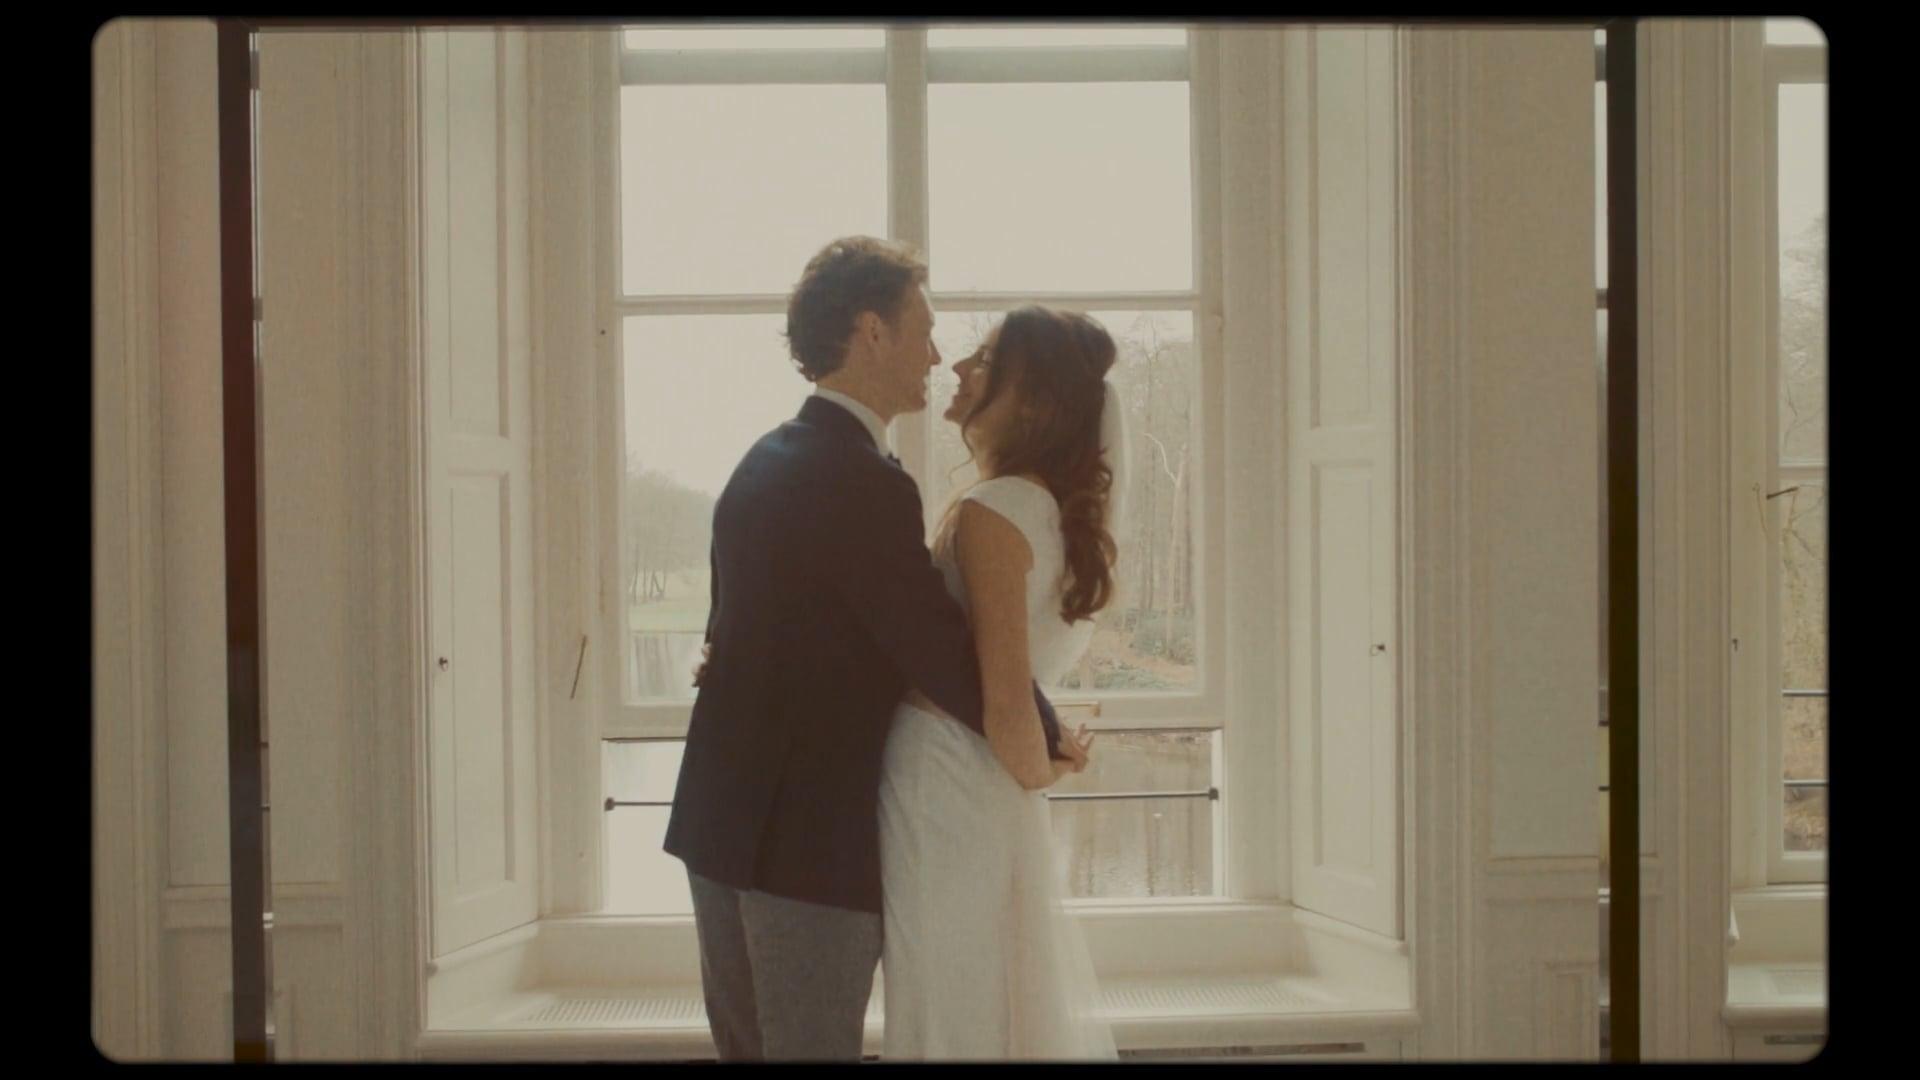 NEW YEAR: SOPHIE & FLORIS - FULL FILM